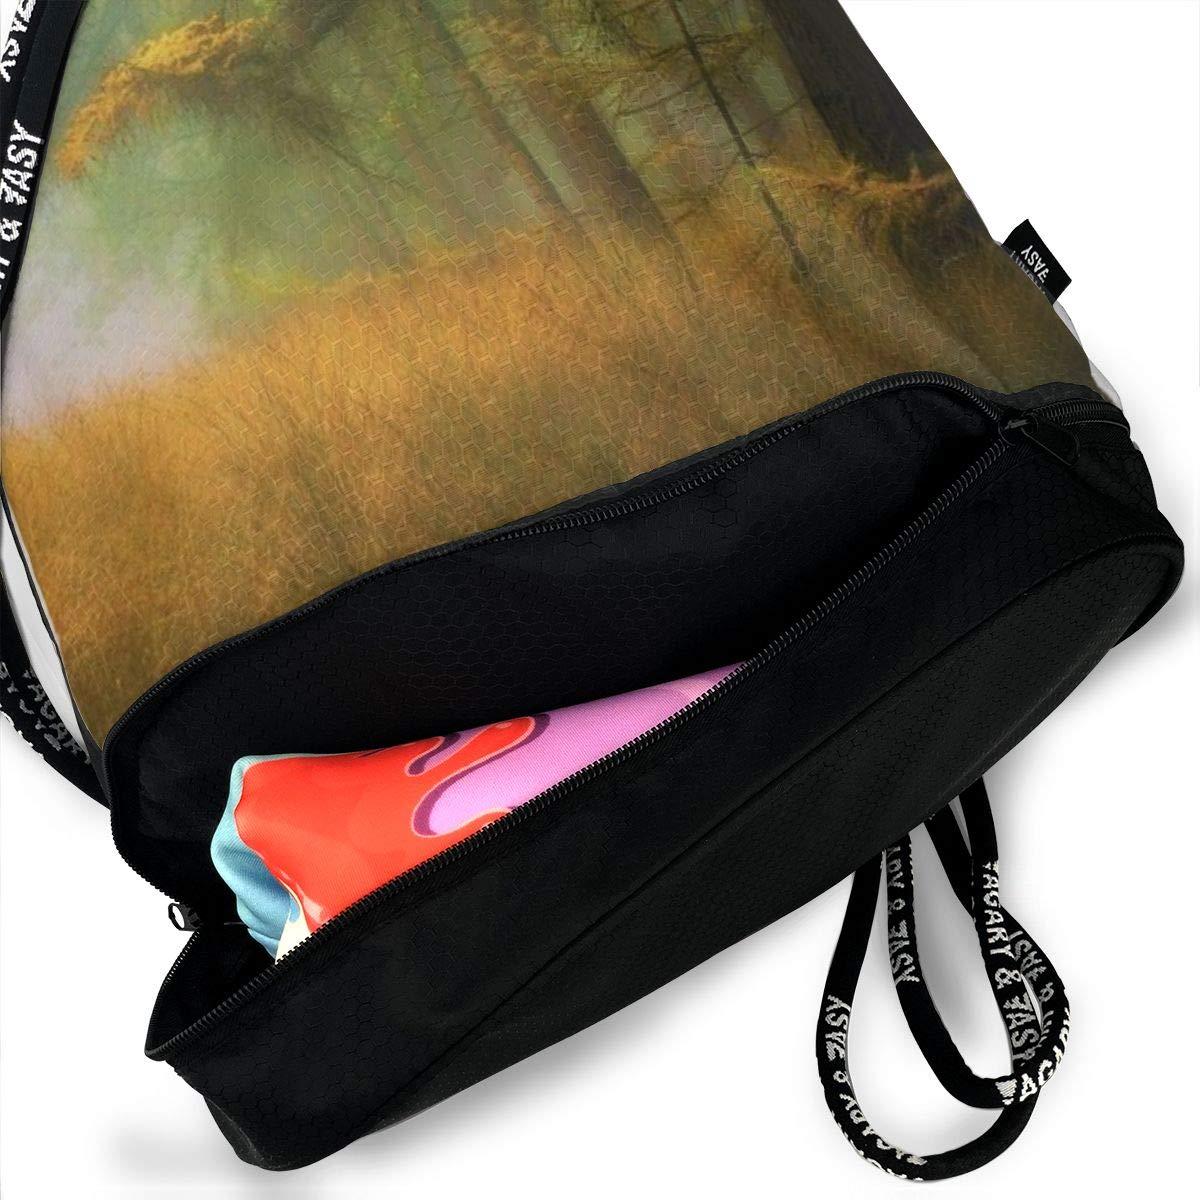 Kji Gym Sack Drawstring Bag Women Scenery Forest Printed Sackpack Sport Cinch Pack Backpack for Men